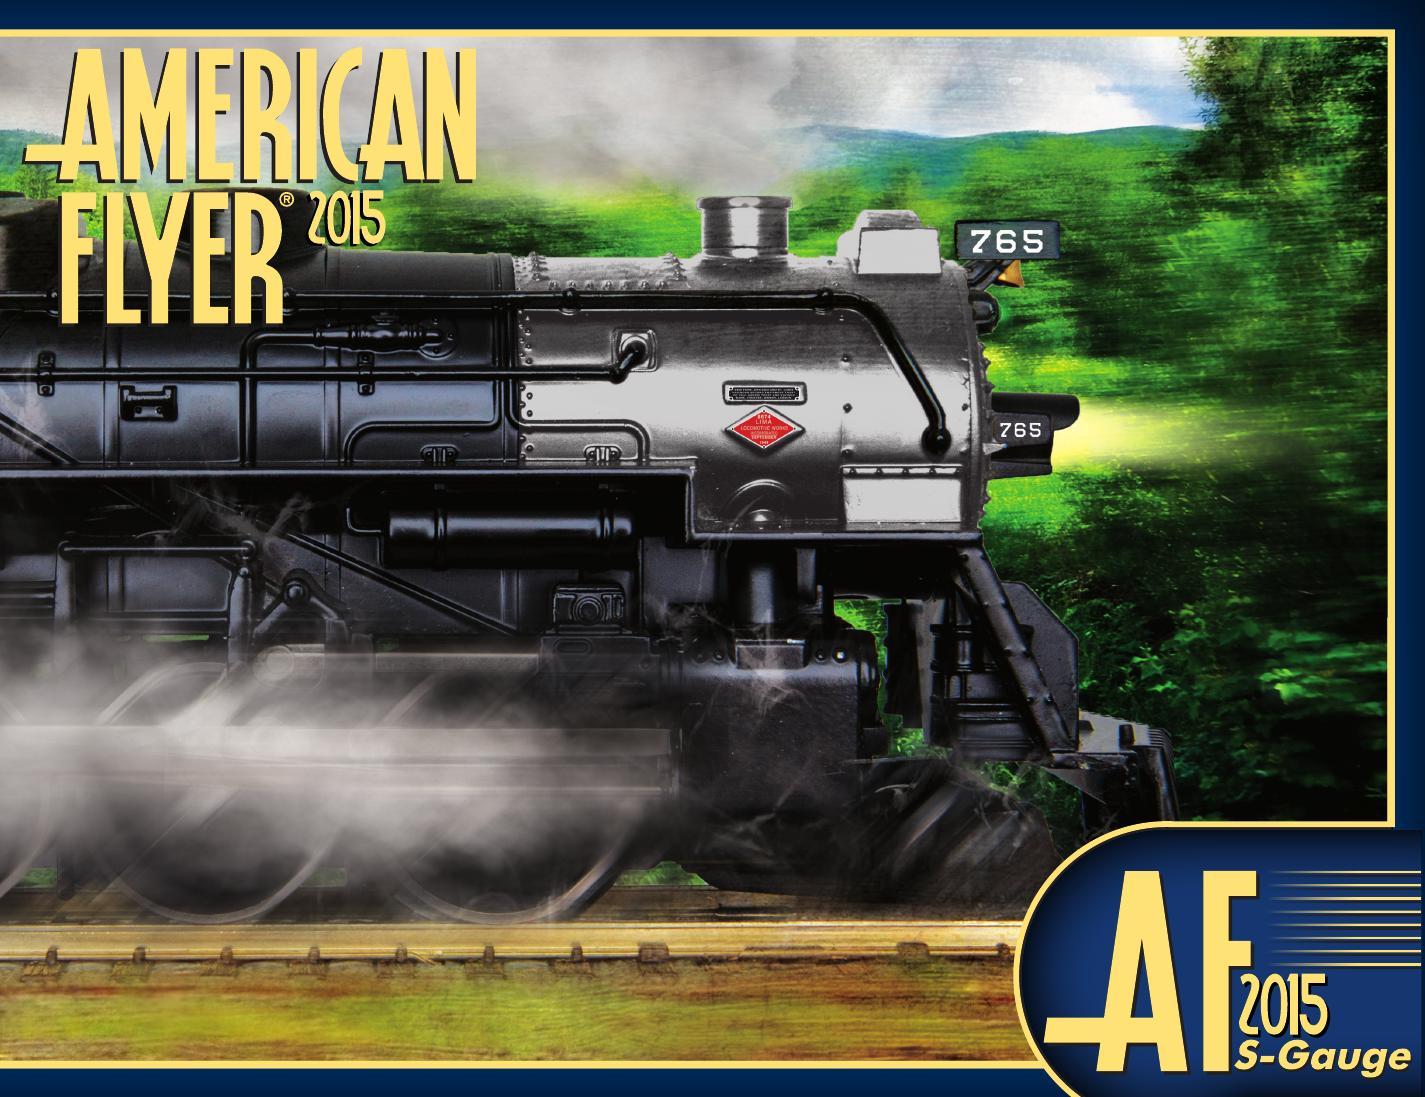 Lionel Catalogs - American Flyer 2015